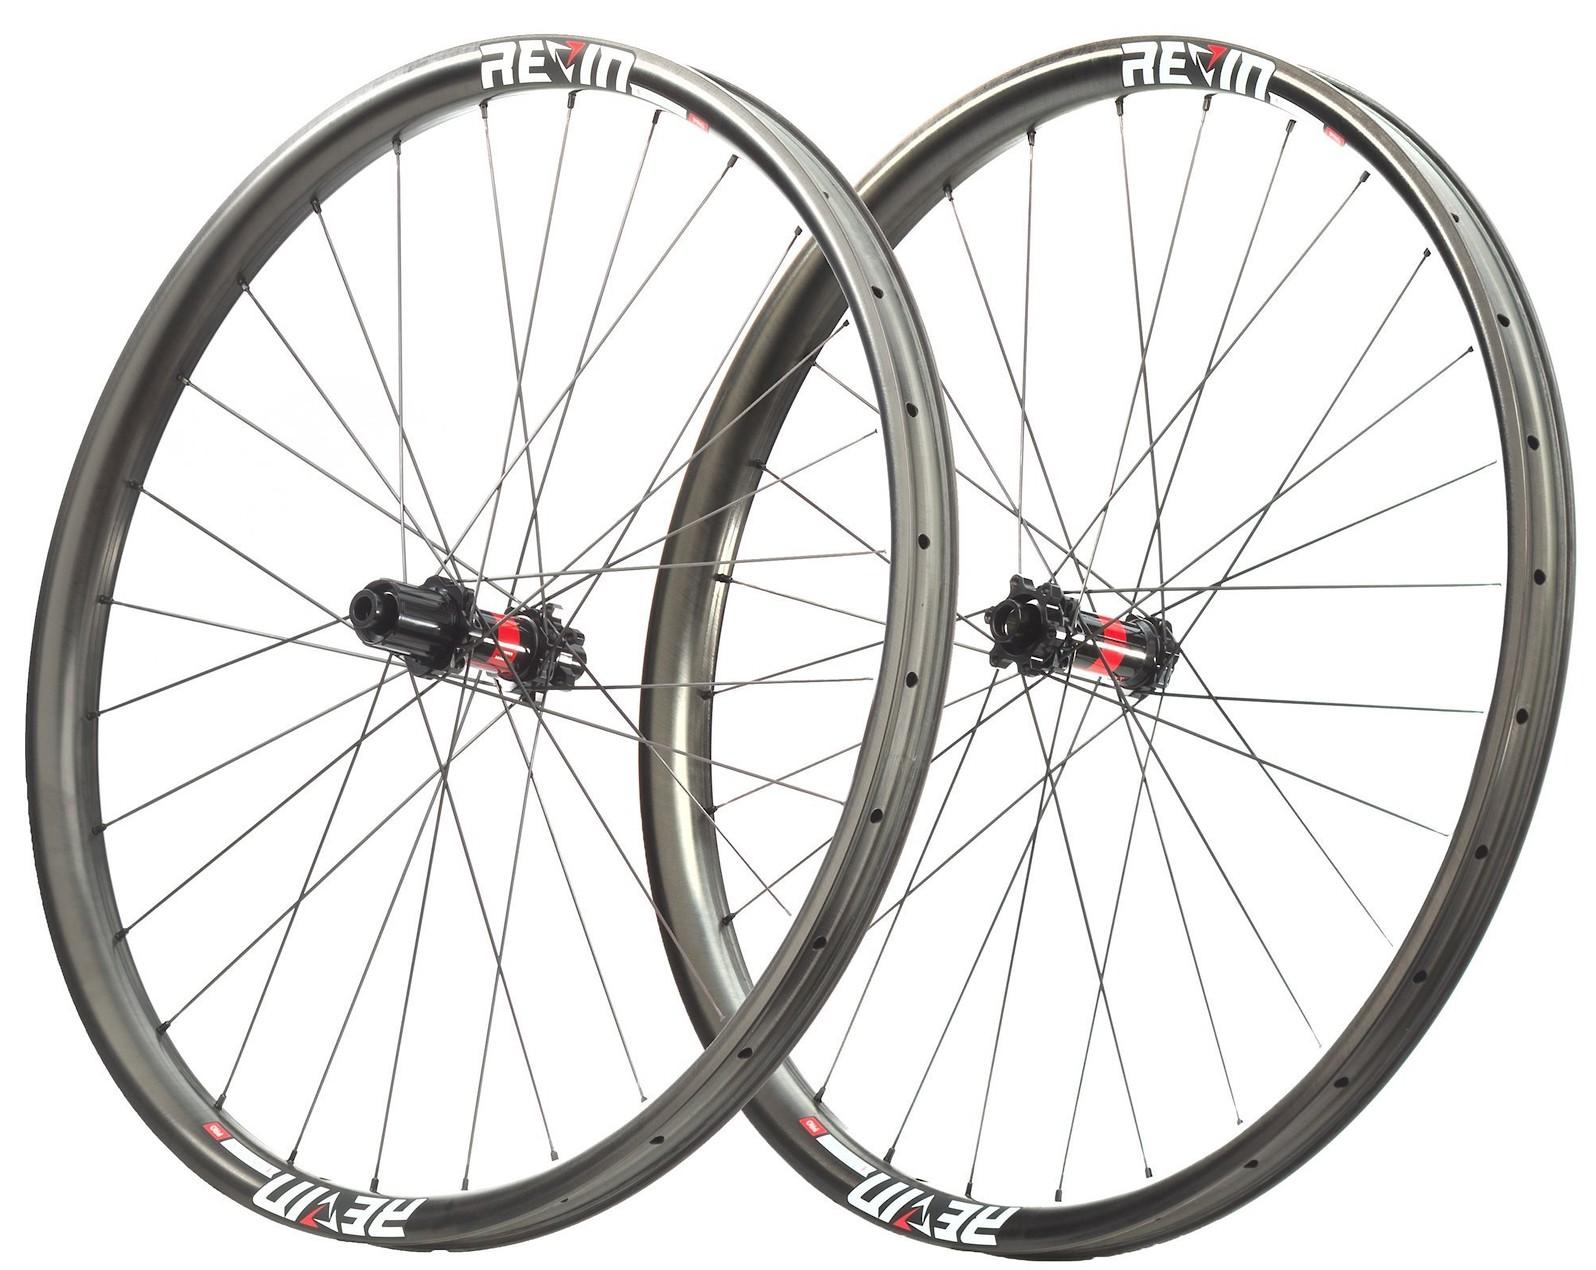 Revin Cycling E27 Pro Carbon MT Wheelset open-uri20180124-5469-1667h1n